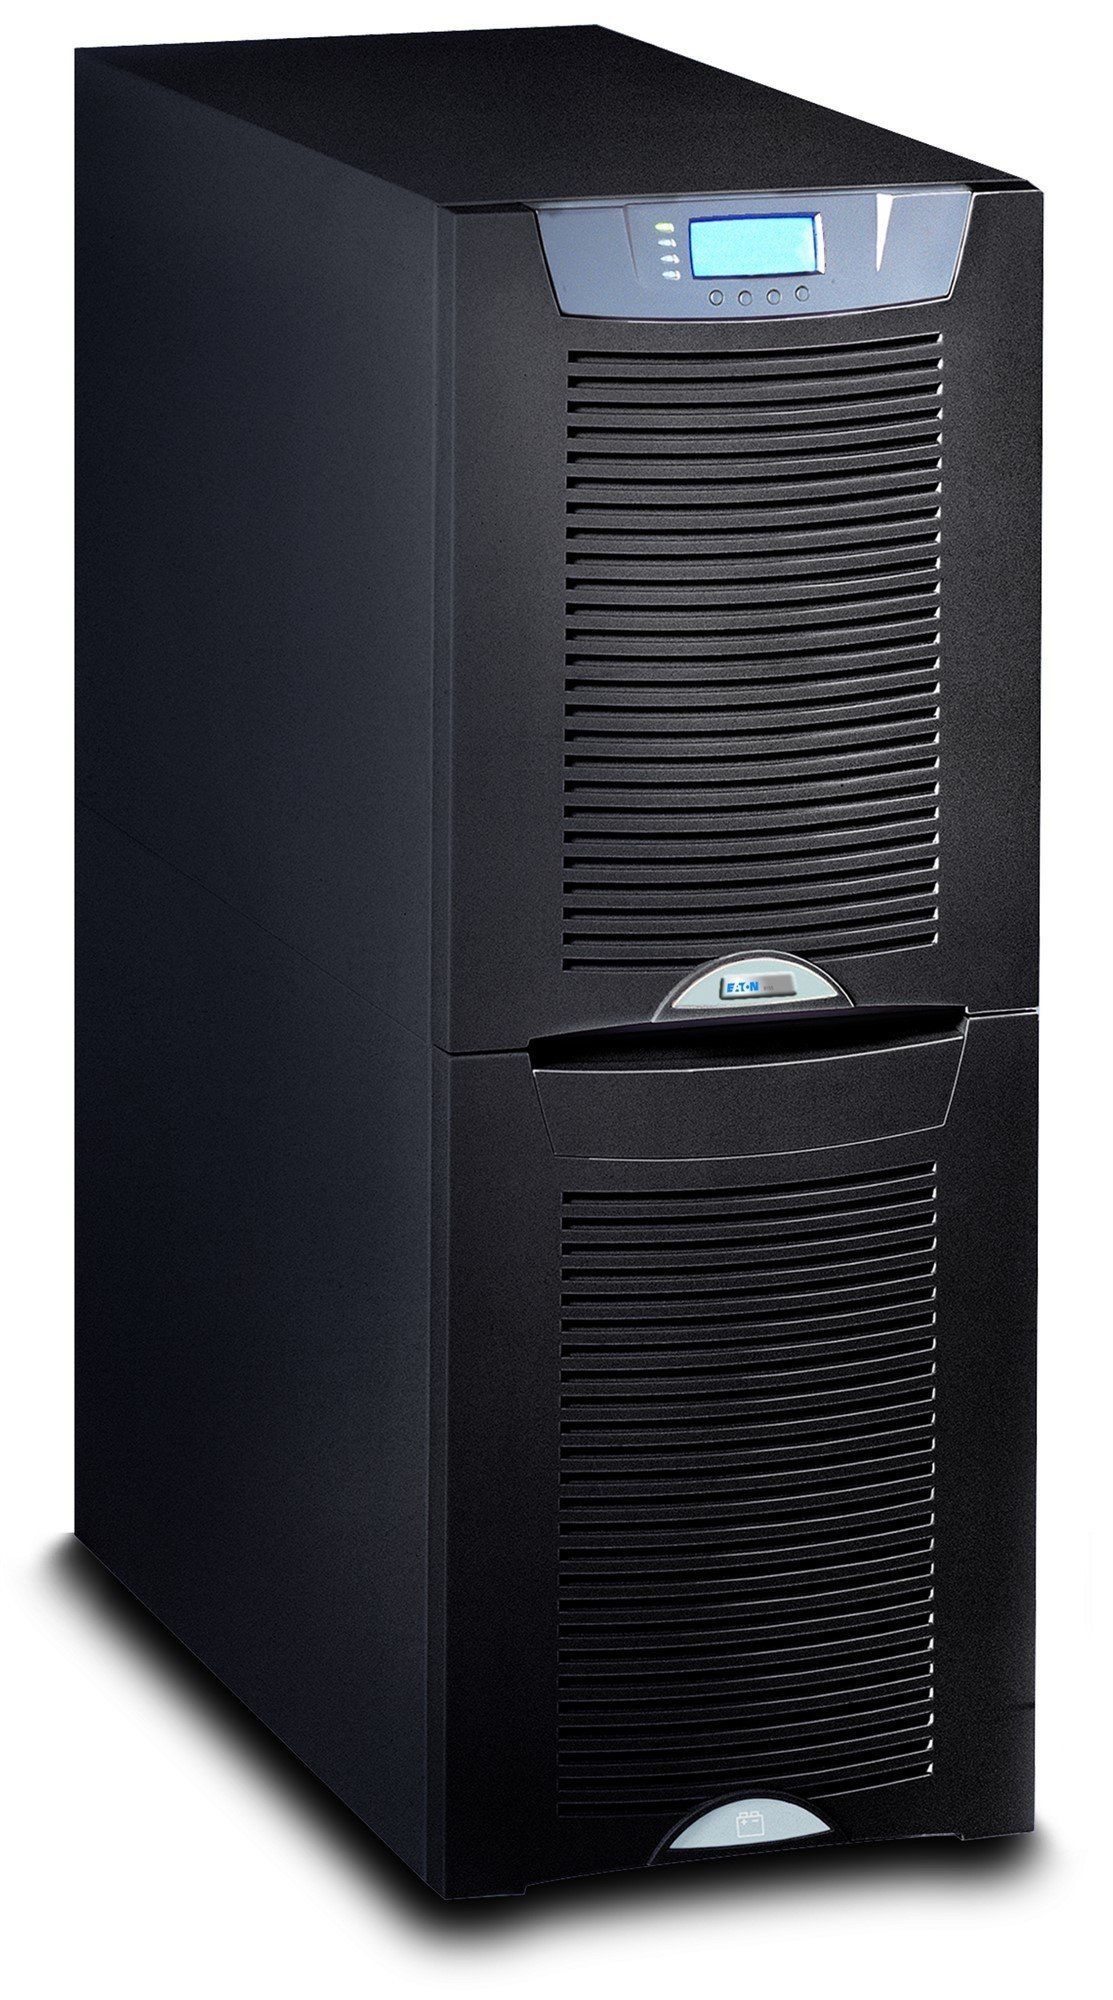 An image of Eaton powerware 9155-12-n-0-64x0ah-mbs 12000va tower black uninterruptible power...